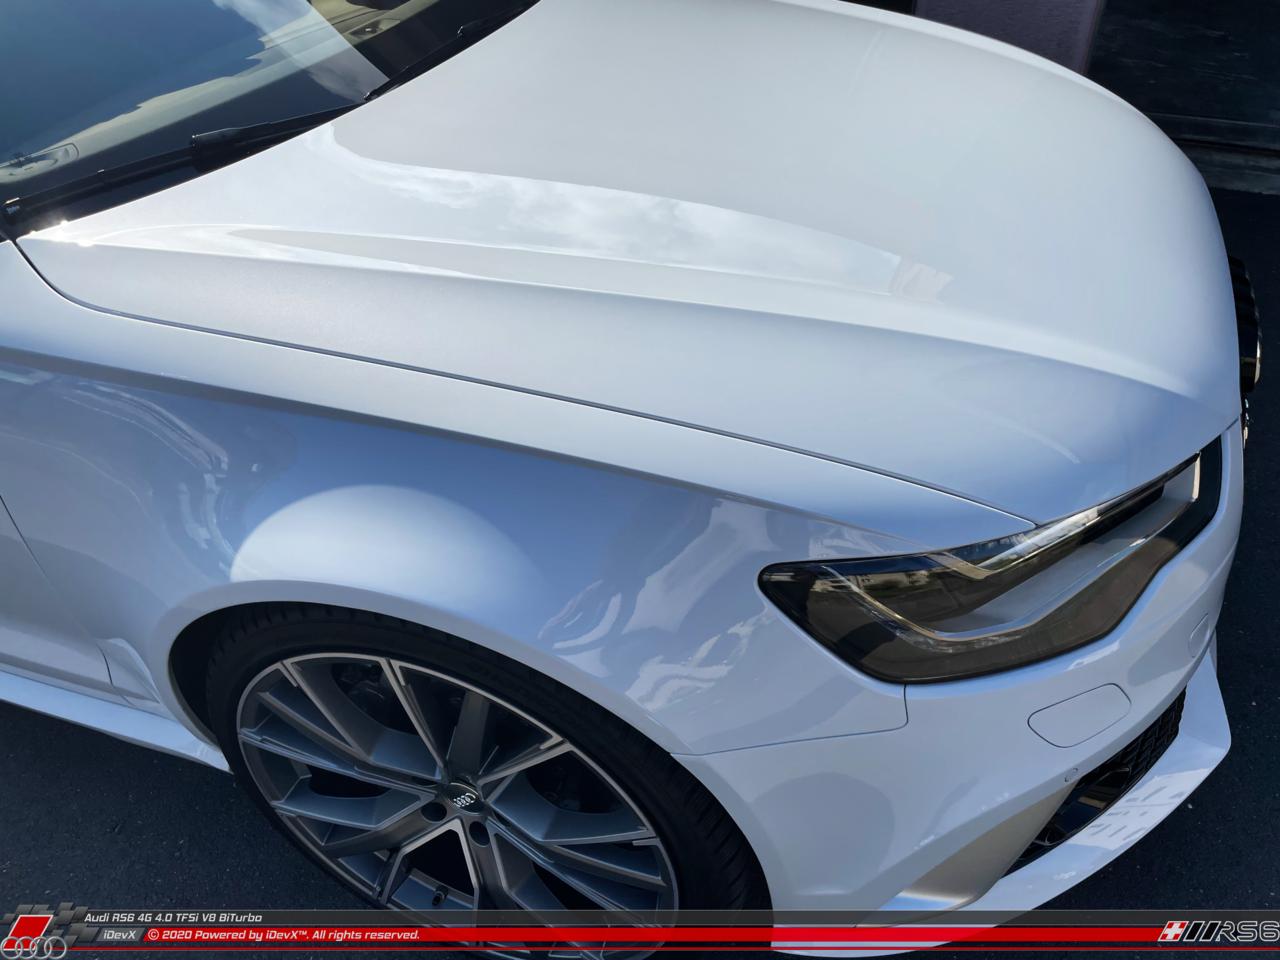 03.04.2021_Audi-RS6_iDevX_005.png